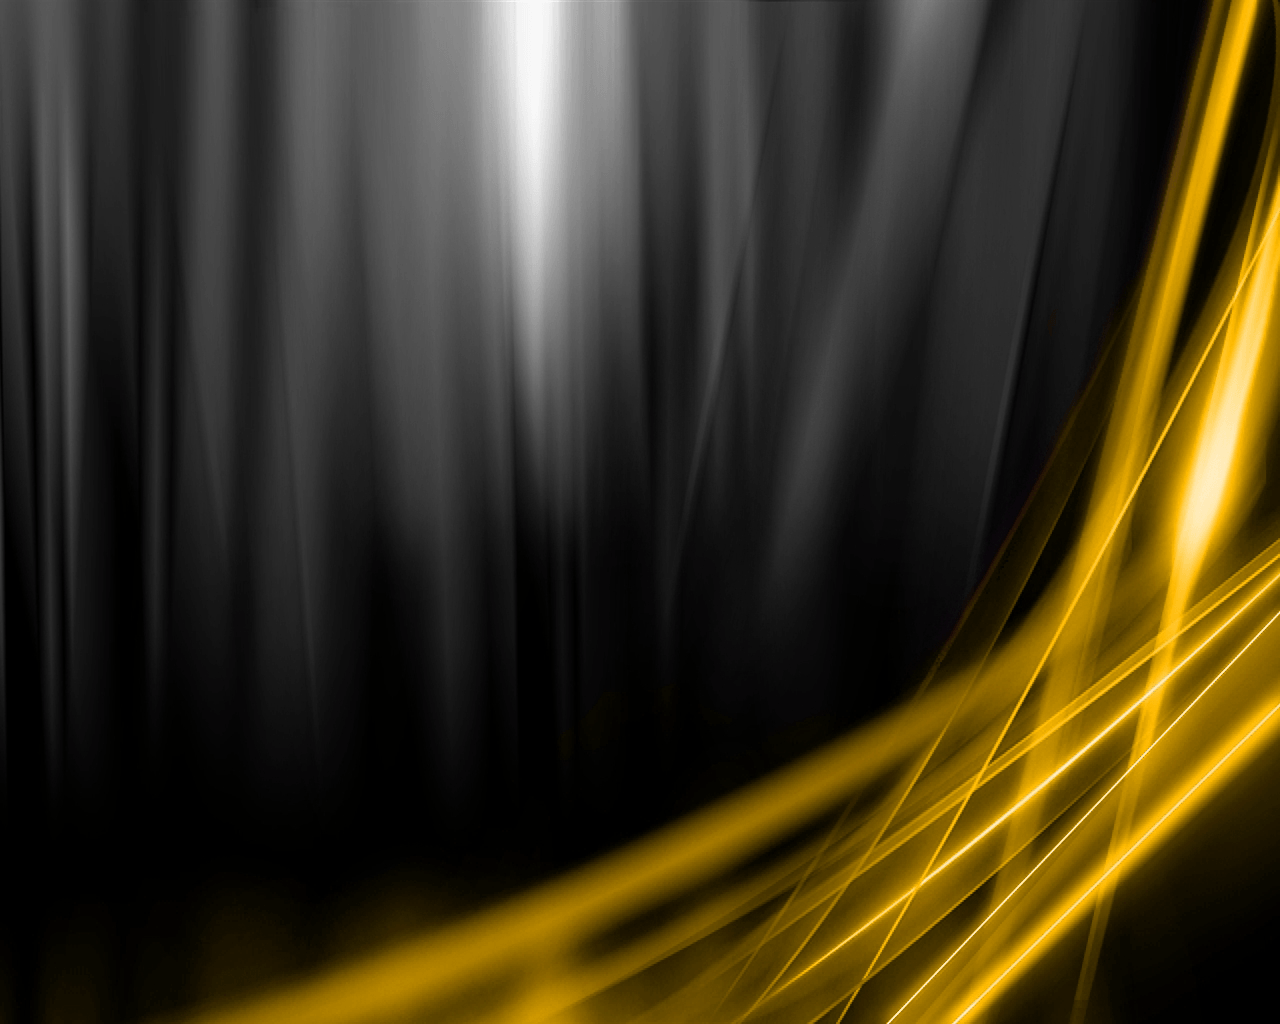 Gold And Black Backgrounds - WallpaperSafari